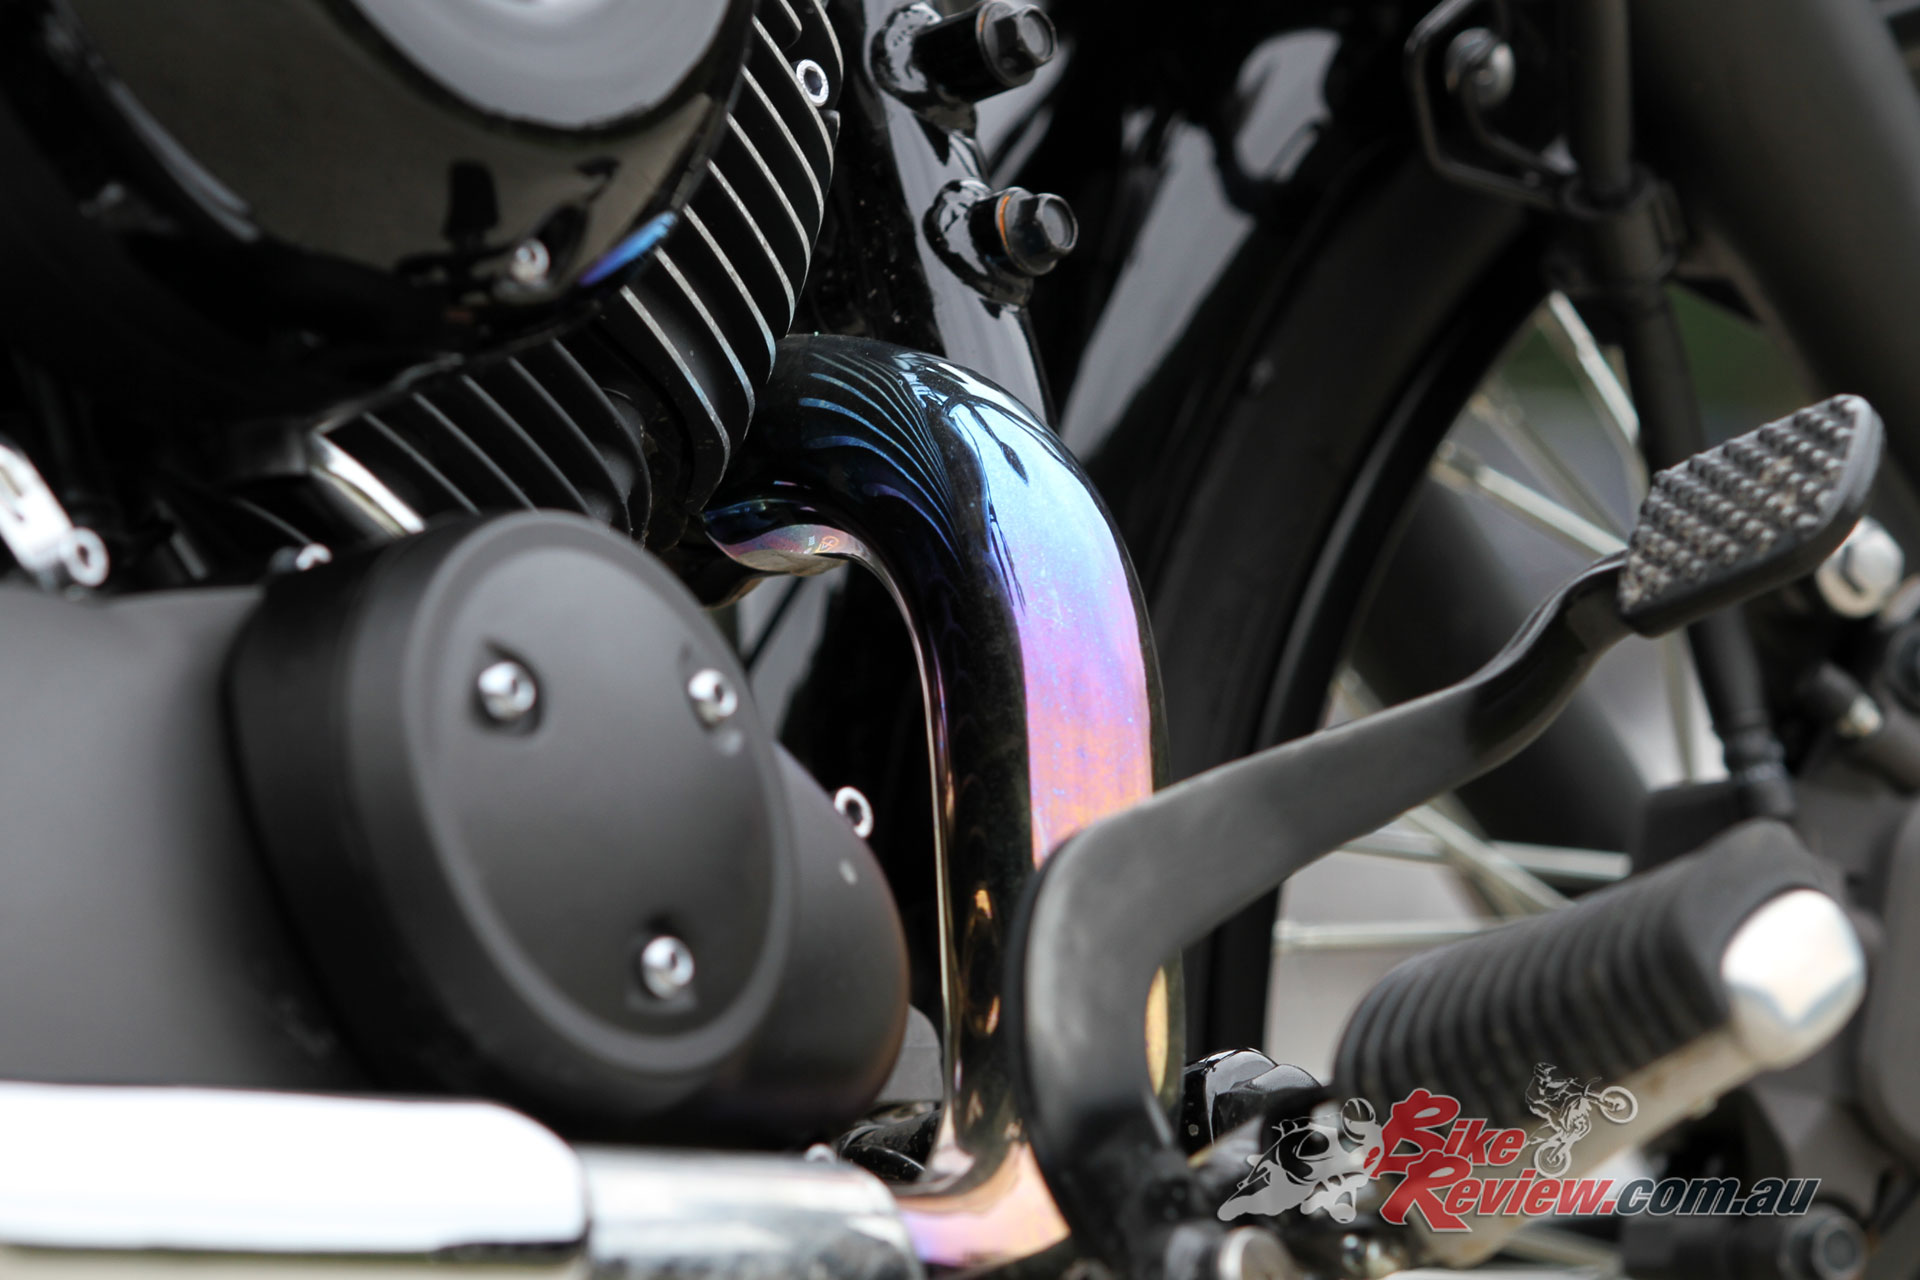 Review: 2019 Yamaha V-Star 650 (XVS650) - Bike Review